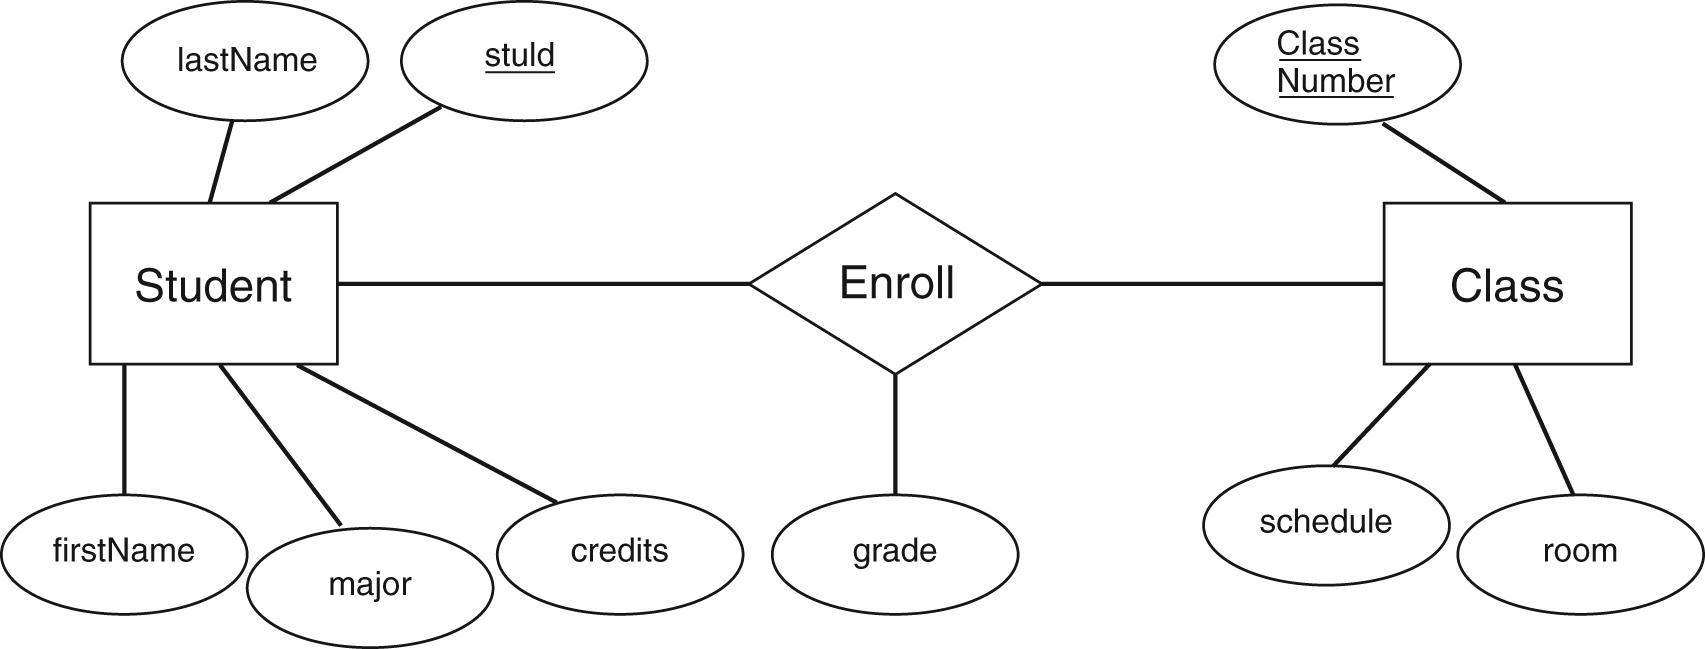 Er Diagram Dbms Examples - 9.ulrich-Temme.de • with regard to Er Diagram Examples Dbms